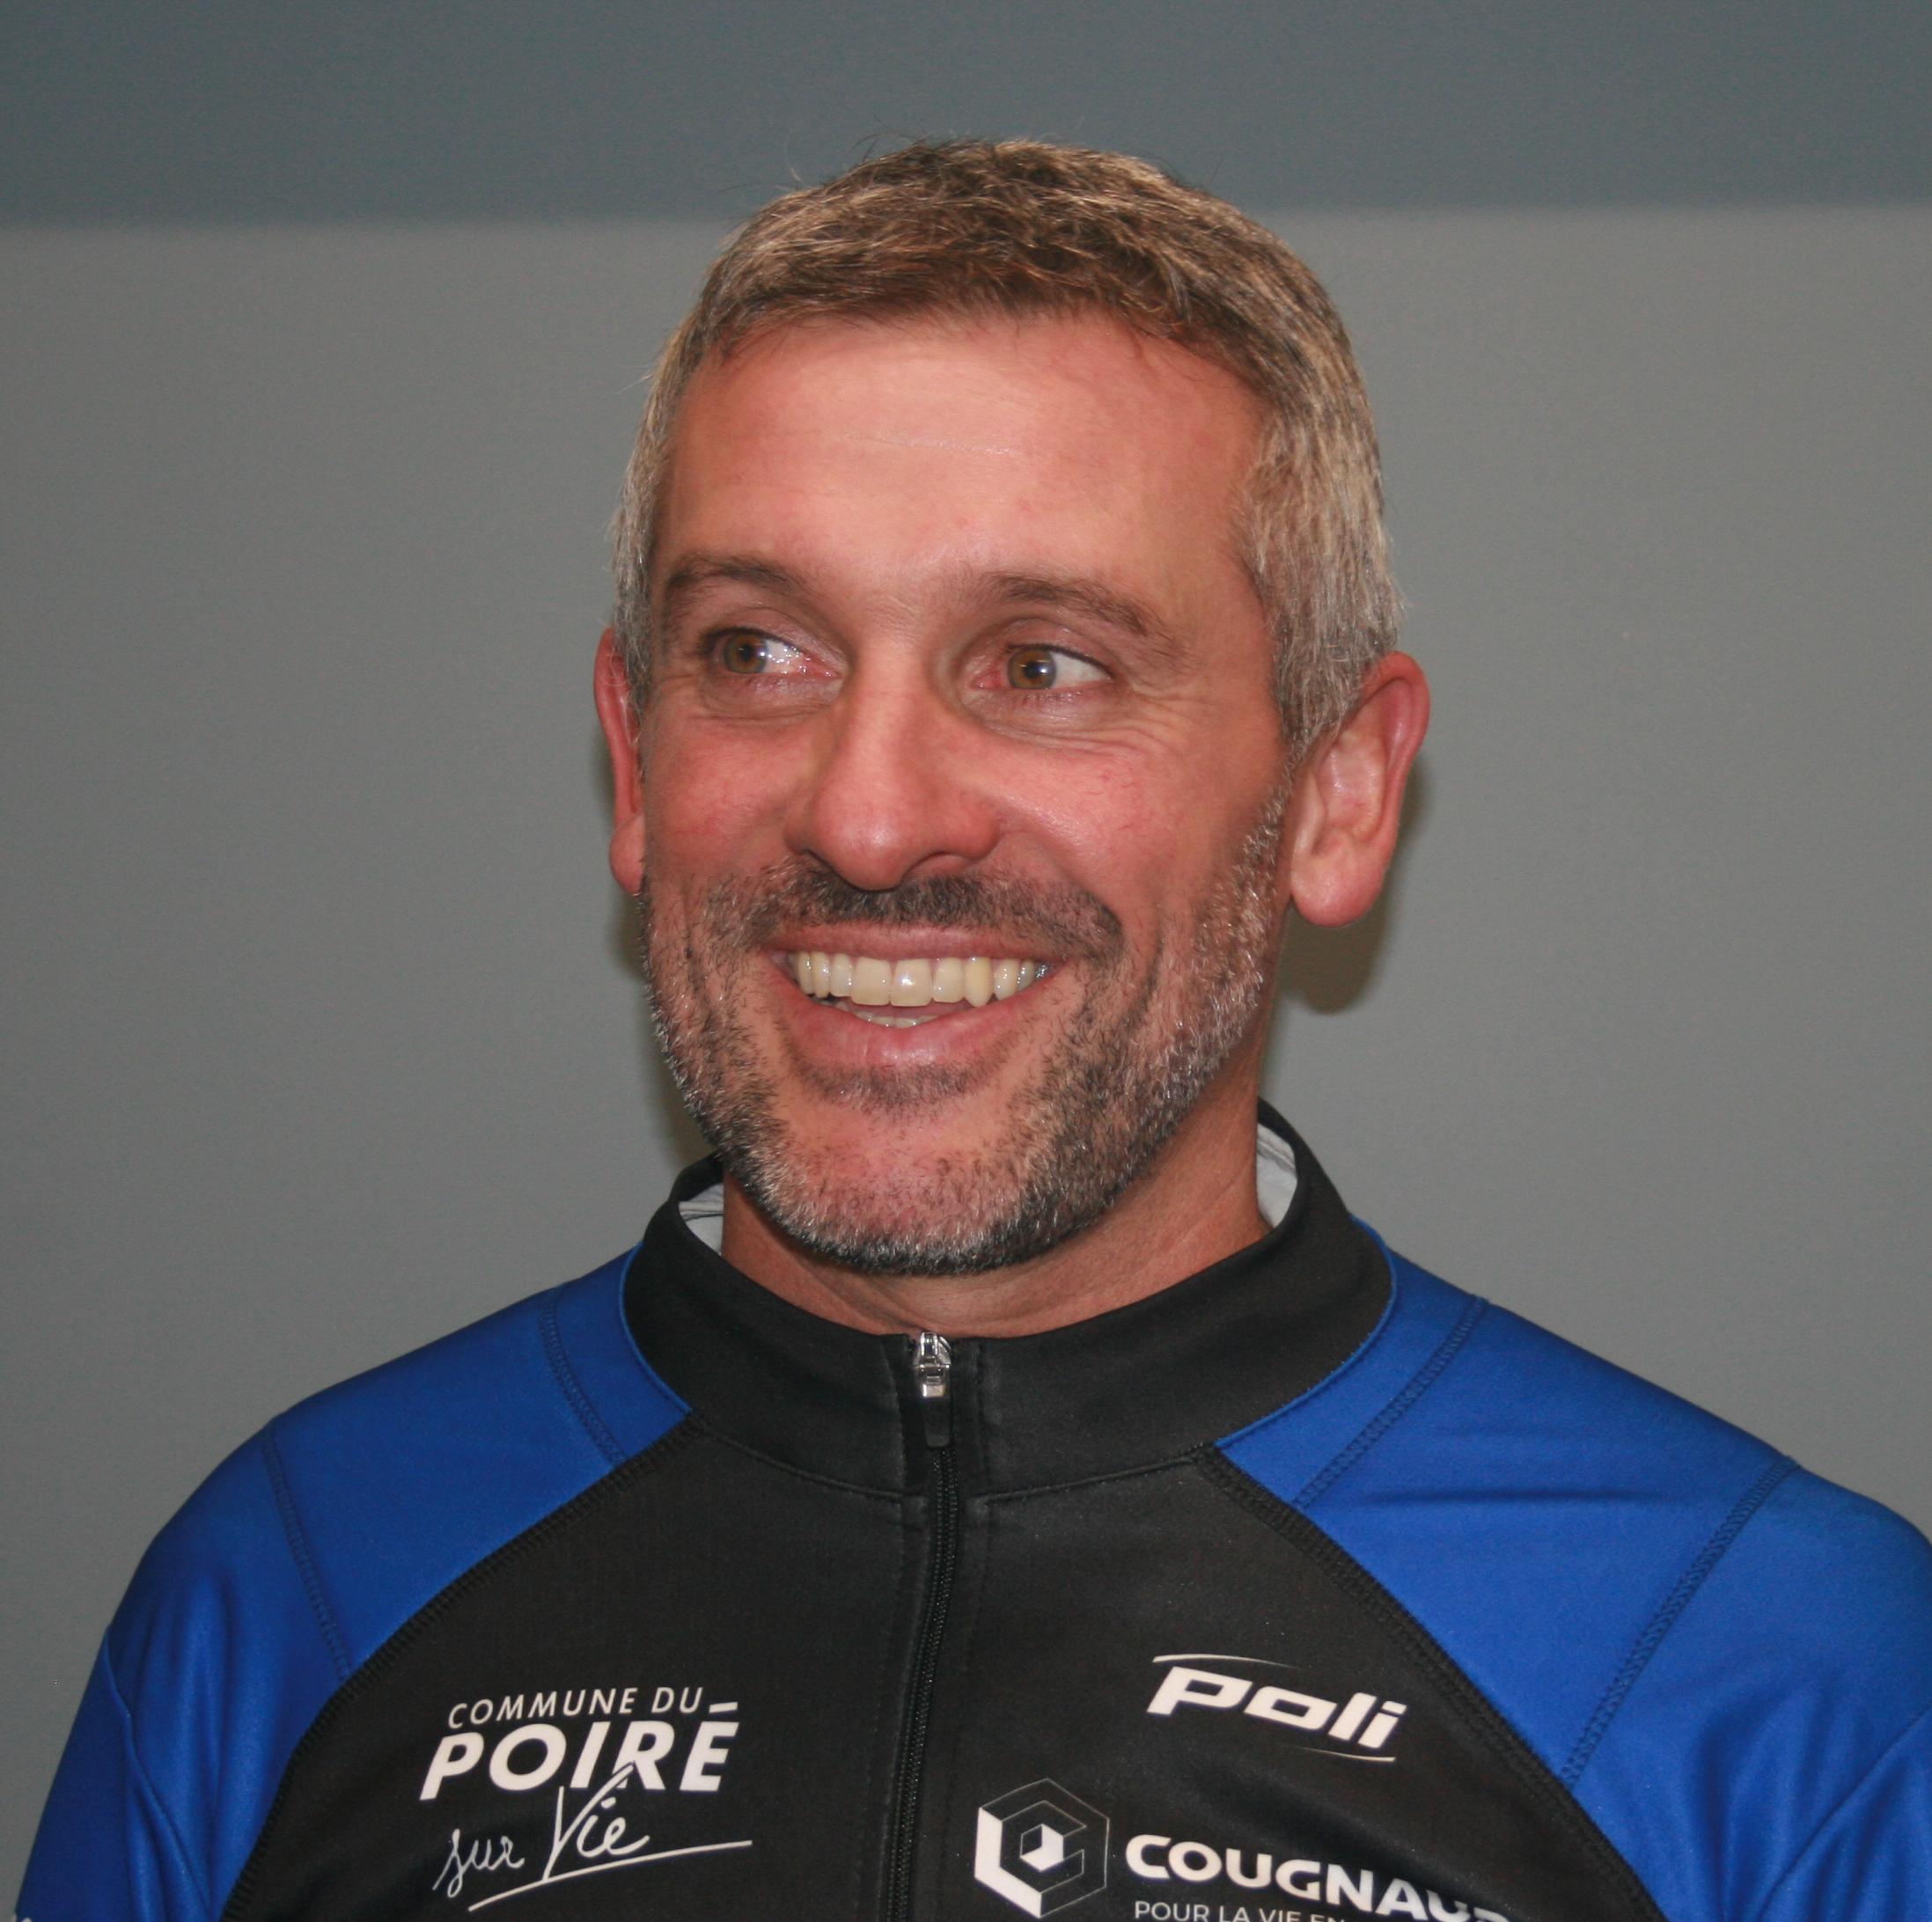 Jean Christophe Renaud